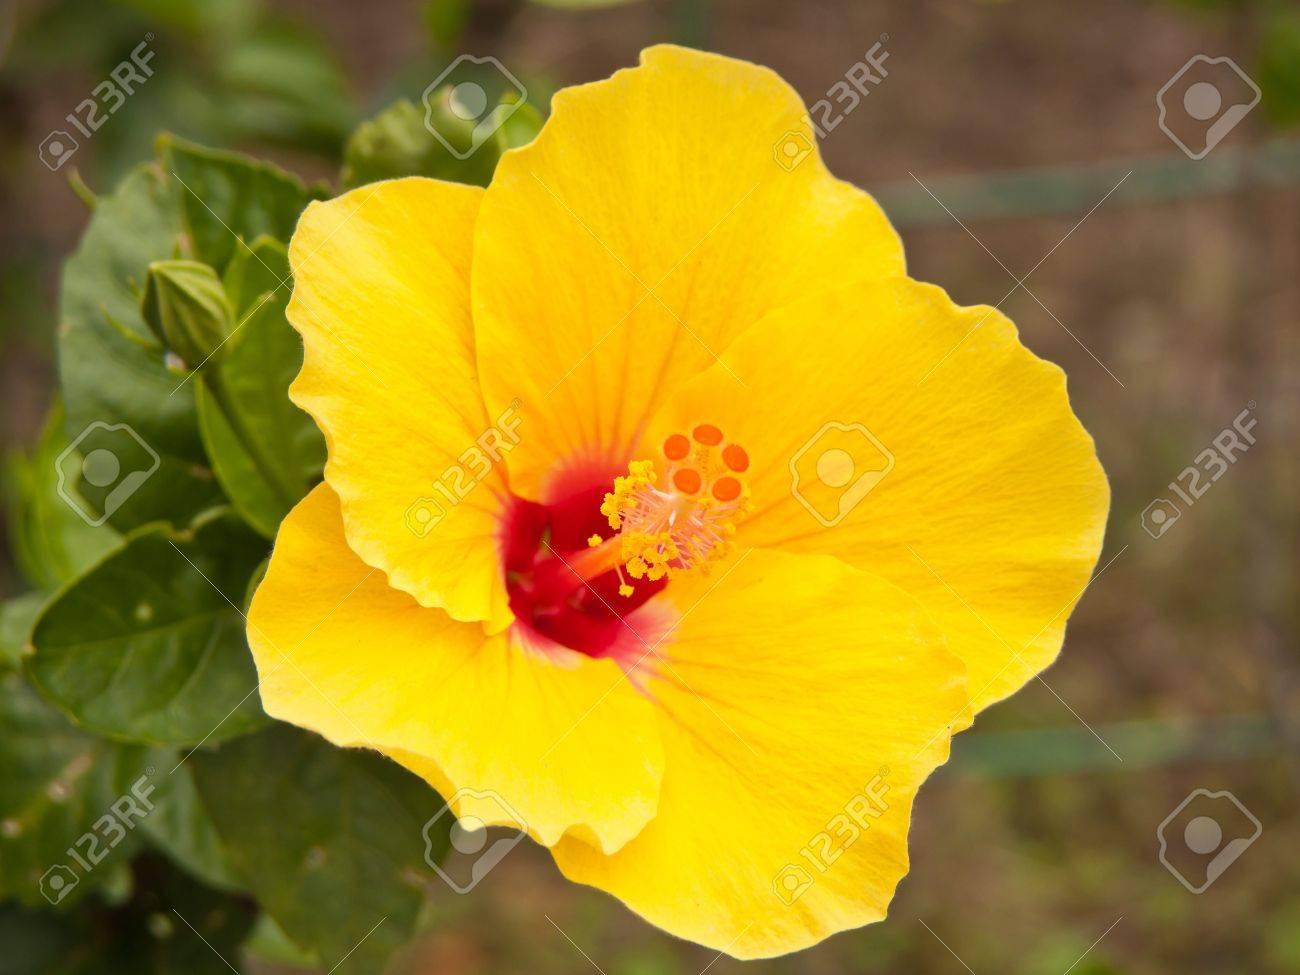 Elegant Yellow Hibiscus Flower Bloom In The Garden Stock Photo